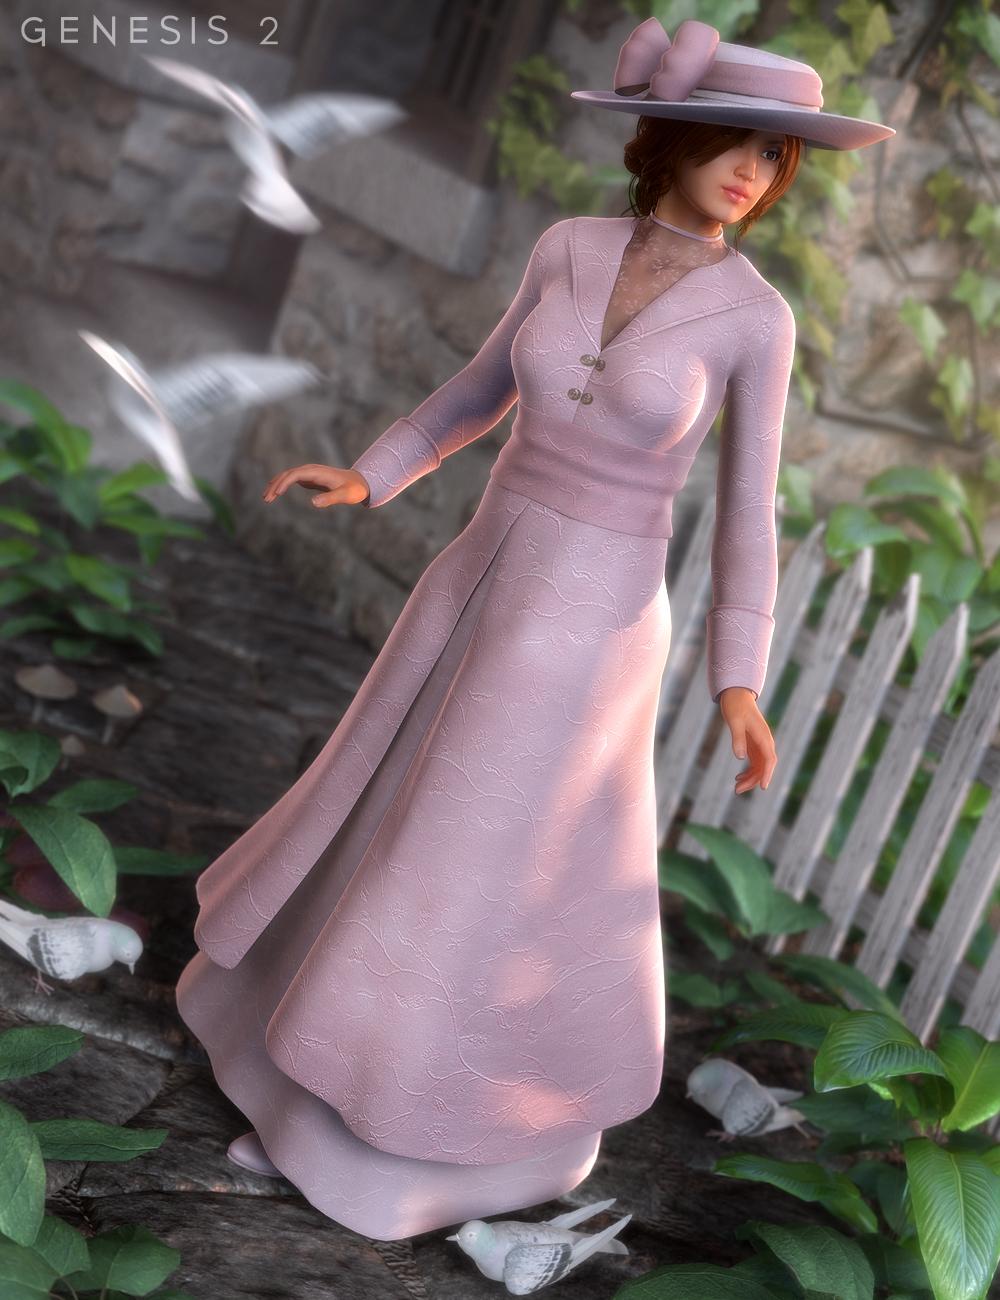 Edwardian Suit for Genesis 2 Female(s) by: Ravenhair, 3D Models by Daz 3D